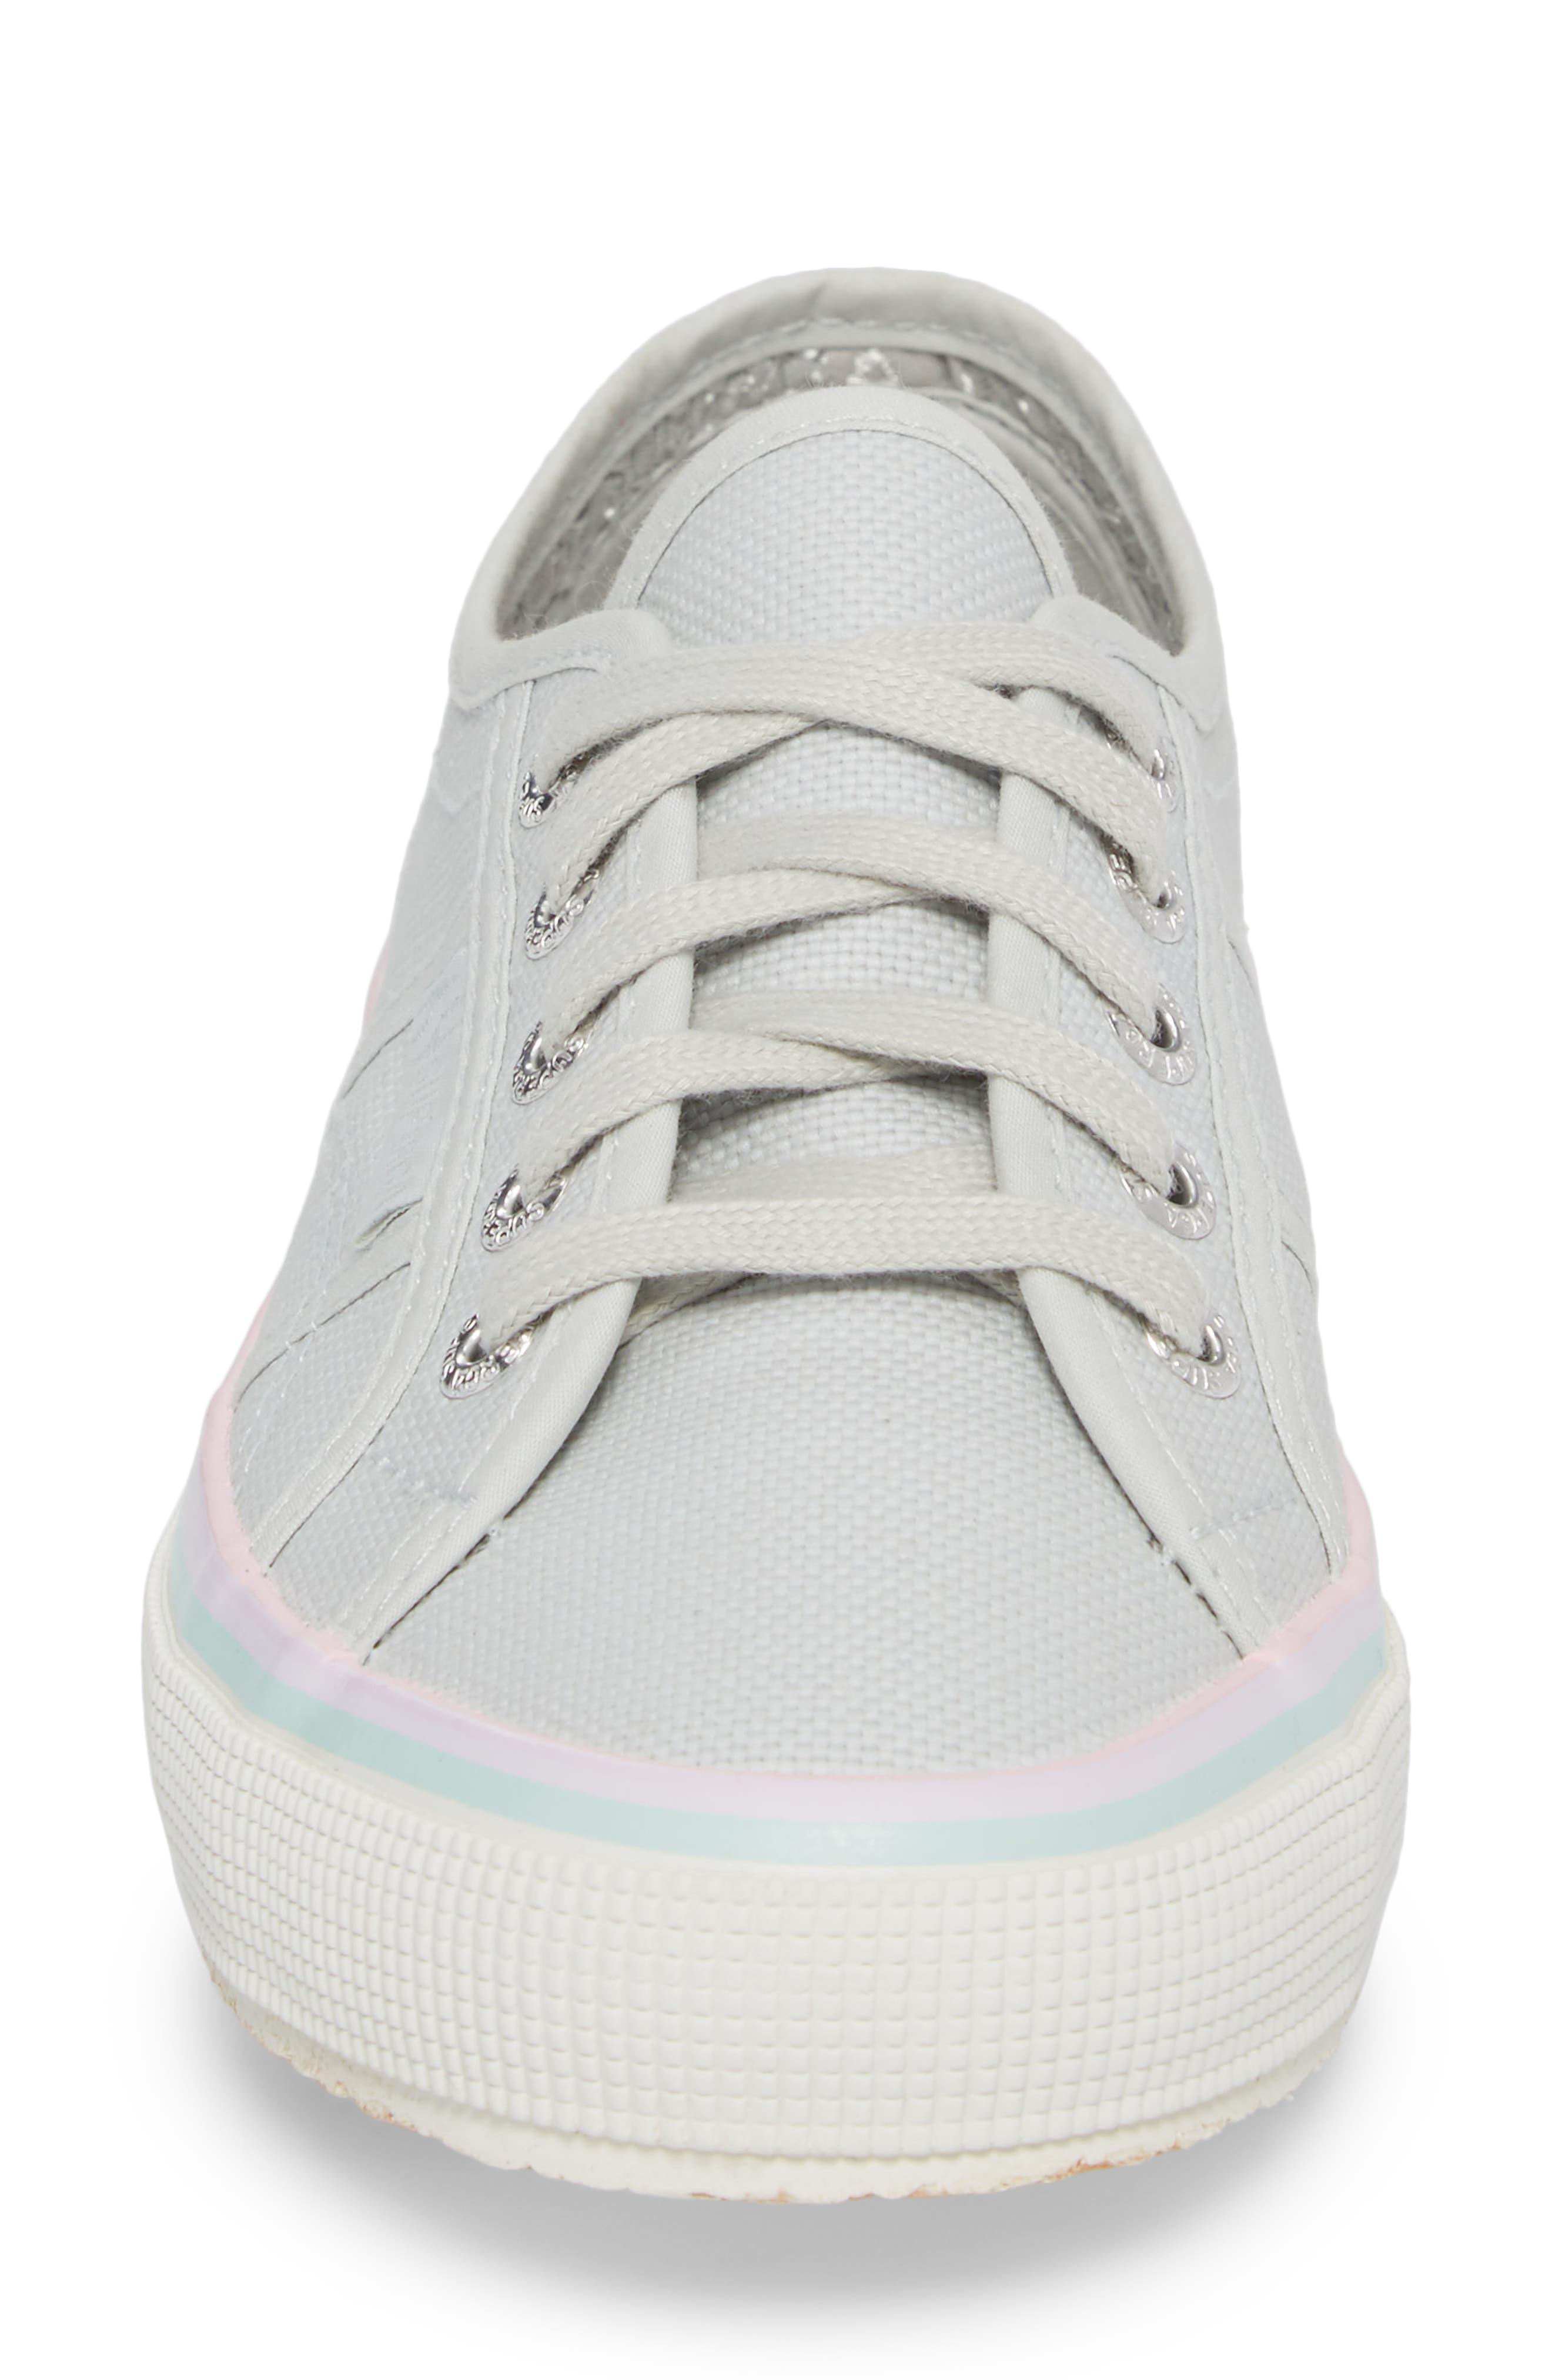 2750 Three-Stripe Sneaker,                             Alternate thumbnail 4, color,                             Aluminum